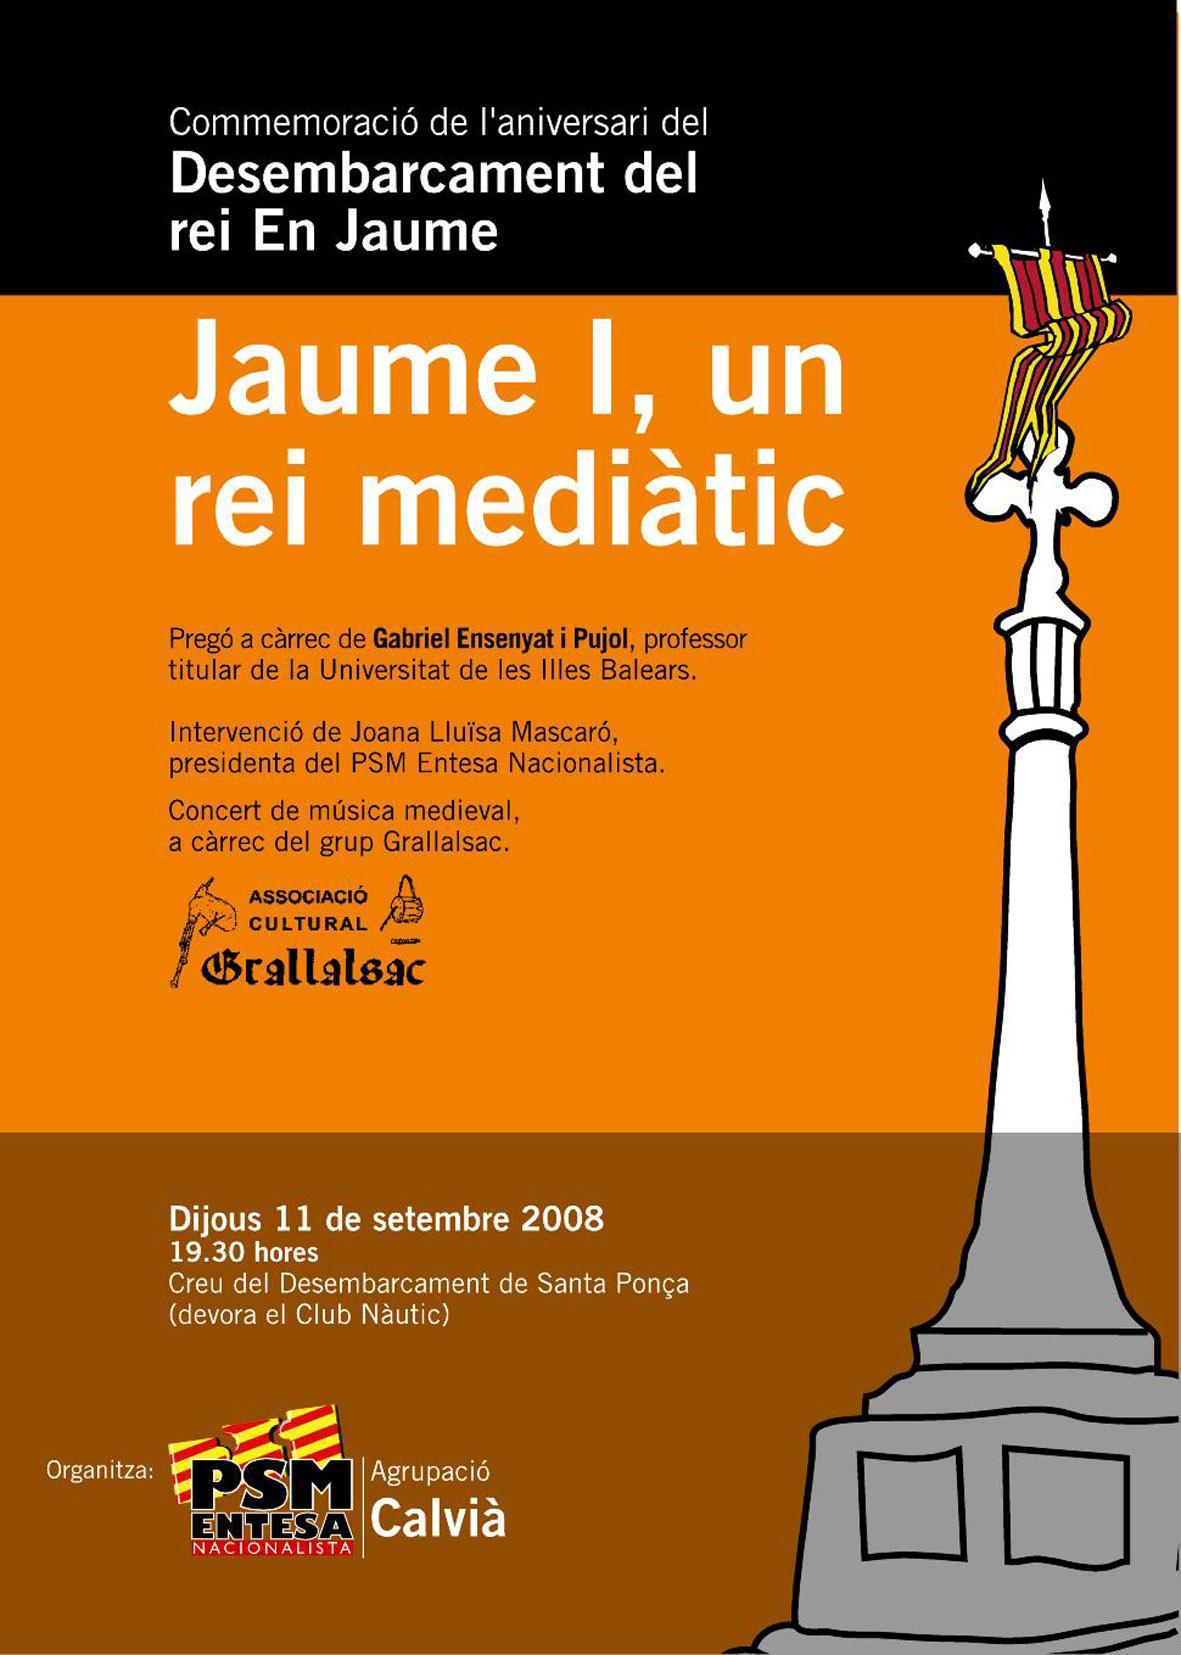 Commemoració desembarcament rei En Jaume 2008